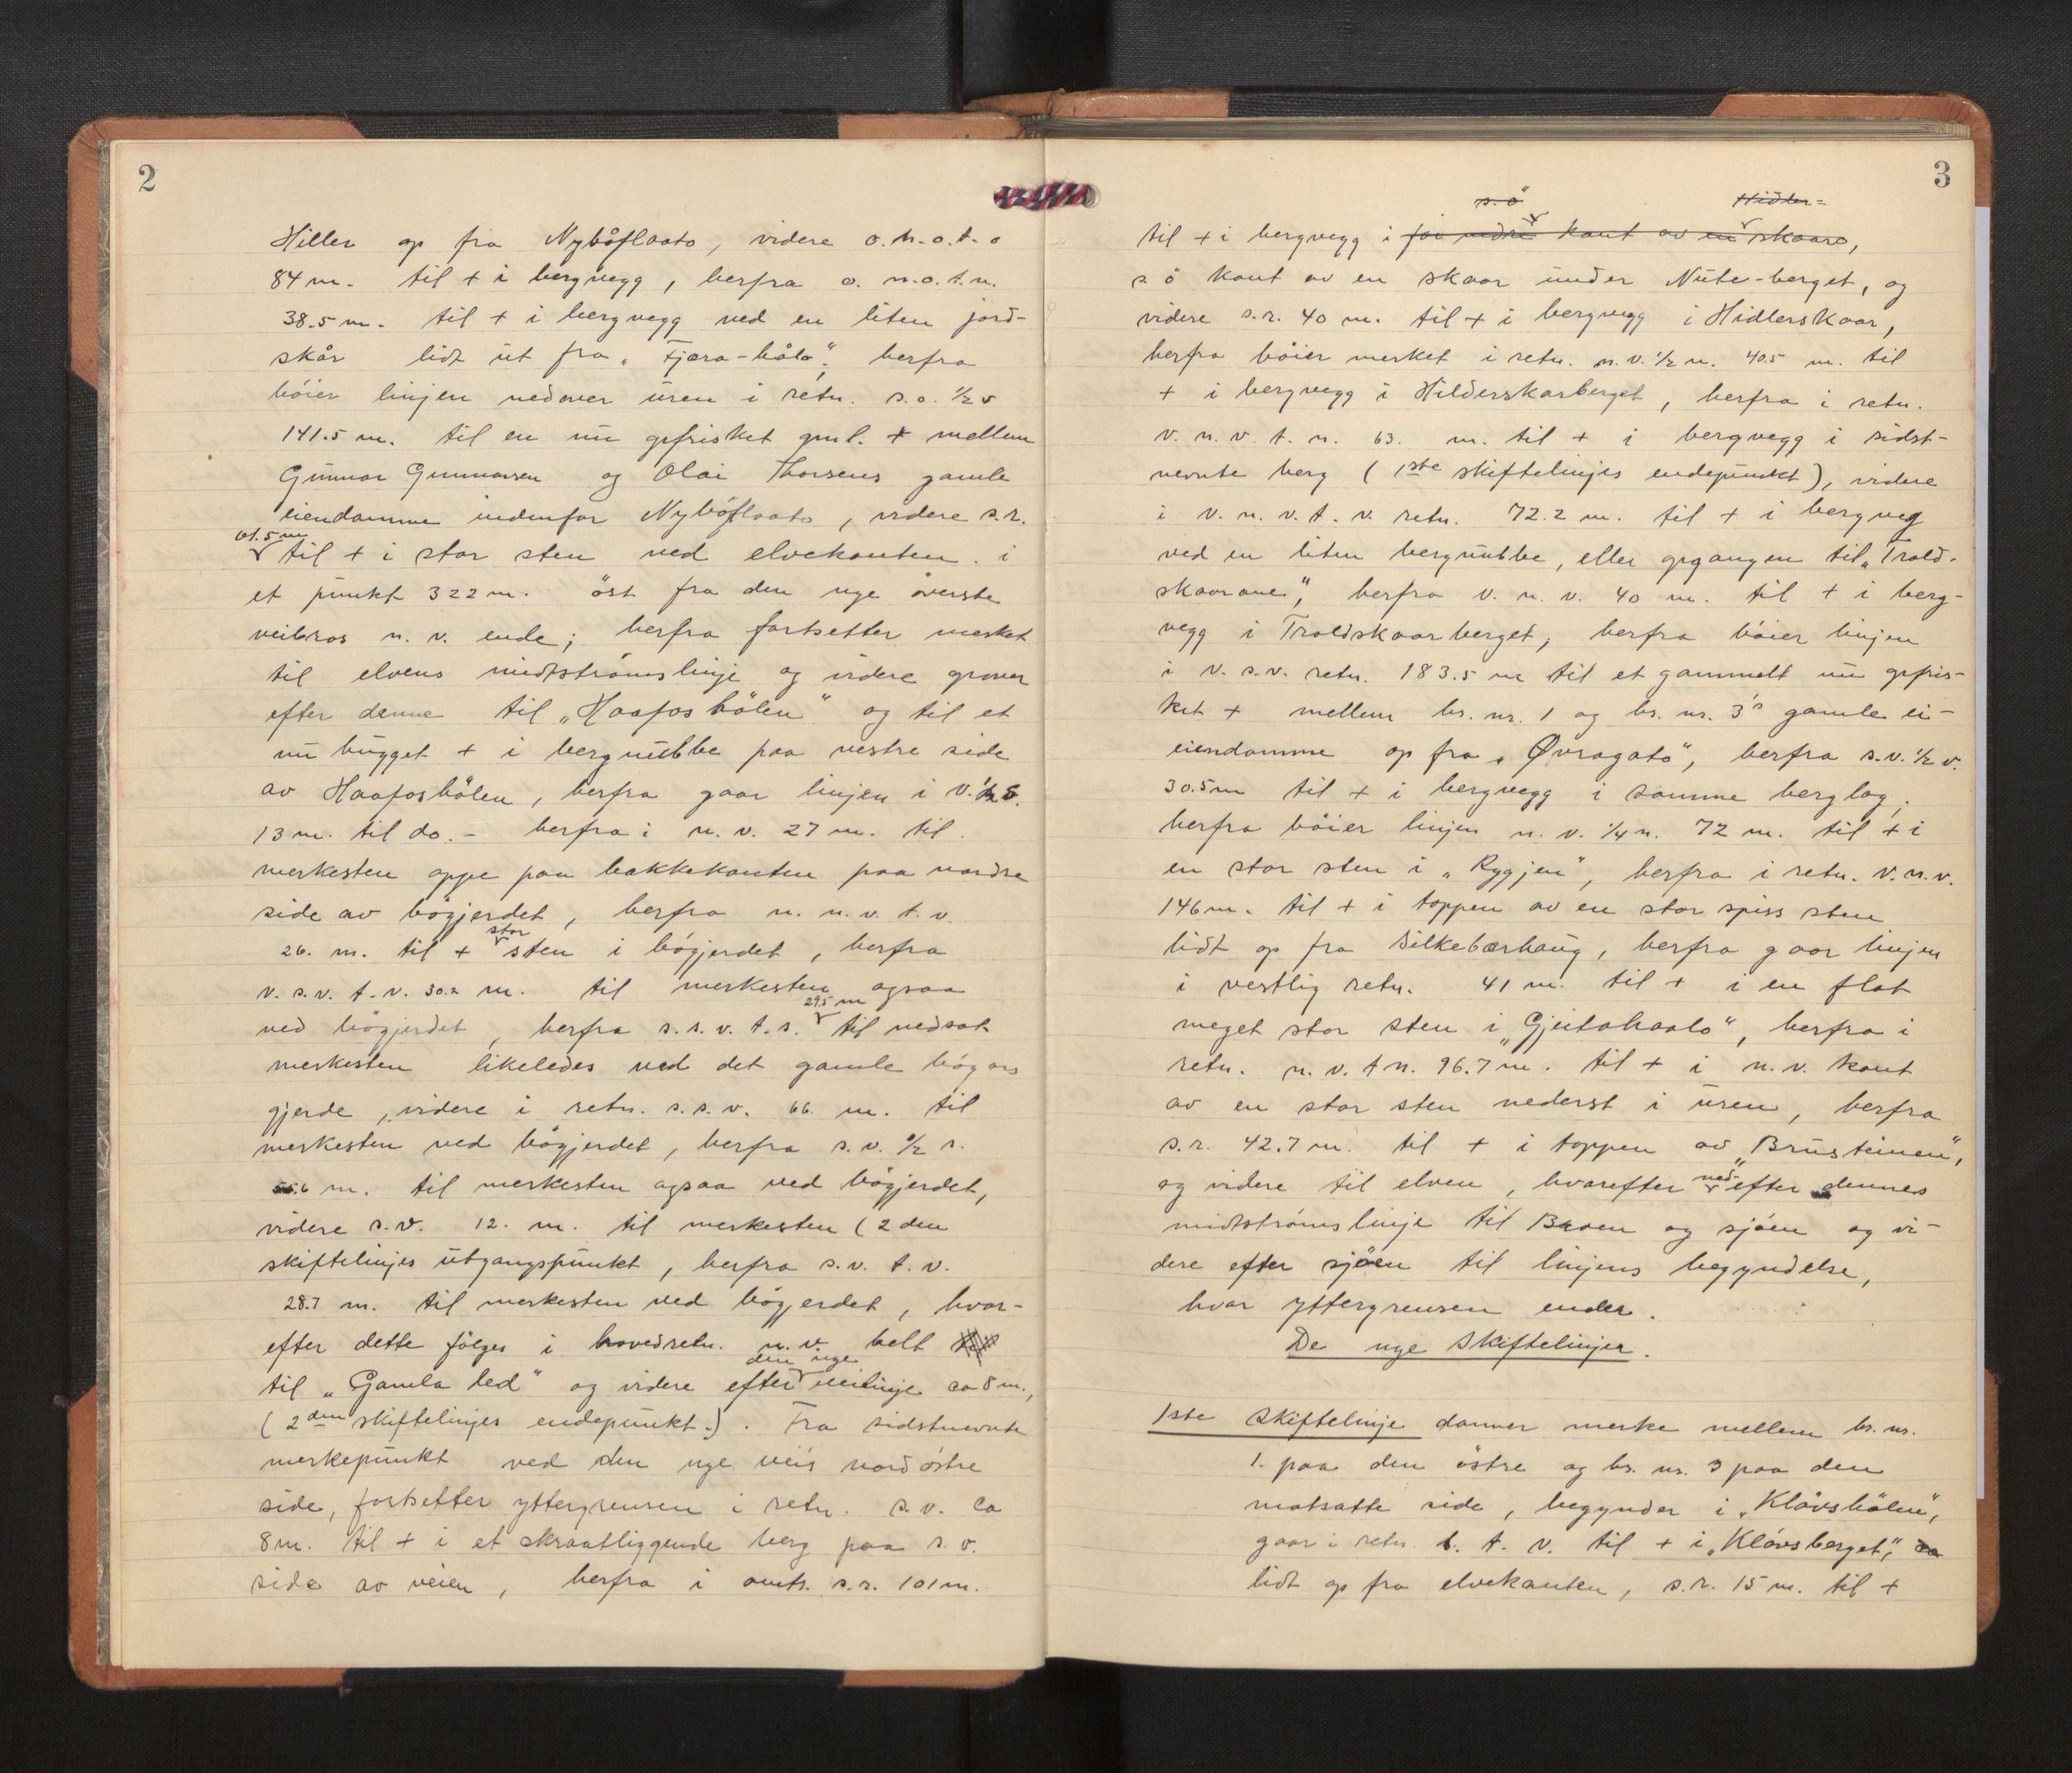 SAB, Hordaland jordskiftedøme - VII Indre Sunnhordland jordskiftedistrikt, A/Aa/L0014: Forhandlingsprotokoll, 1929-1932, s. 2-3